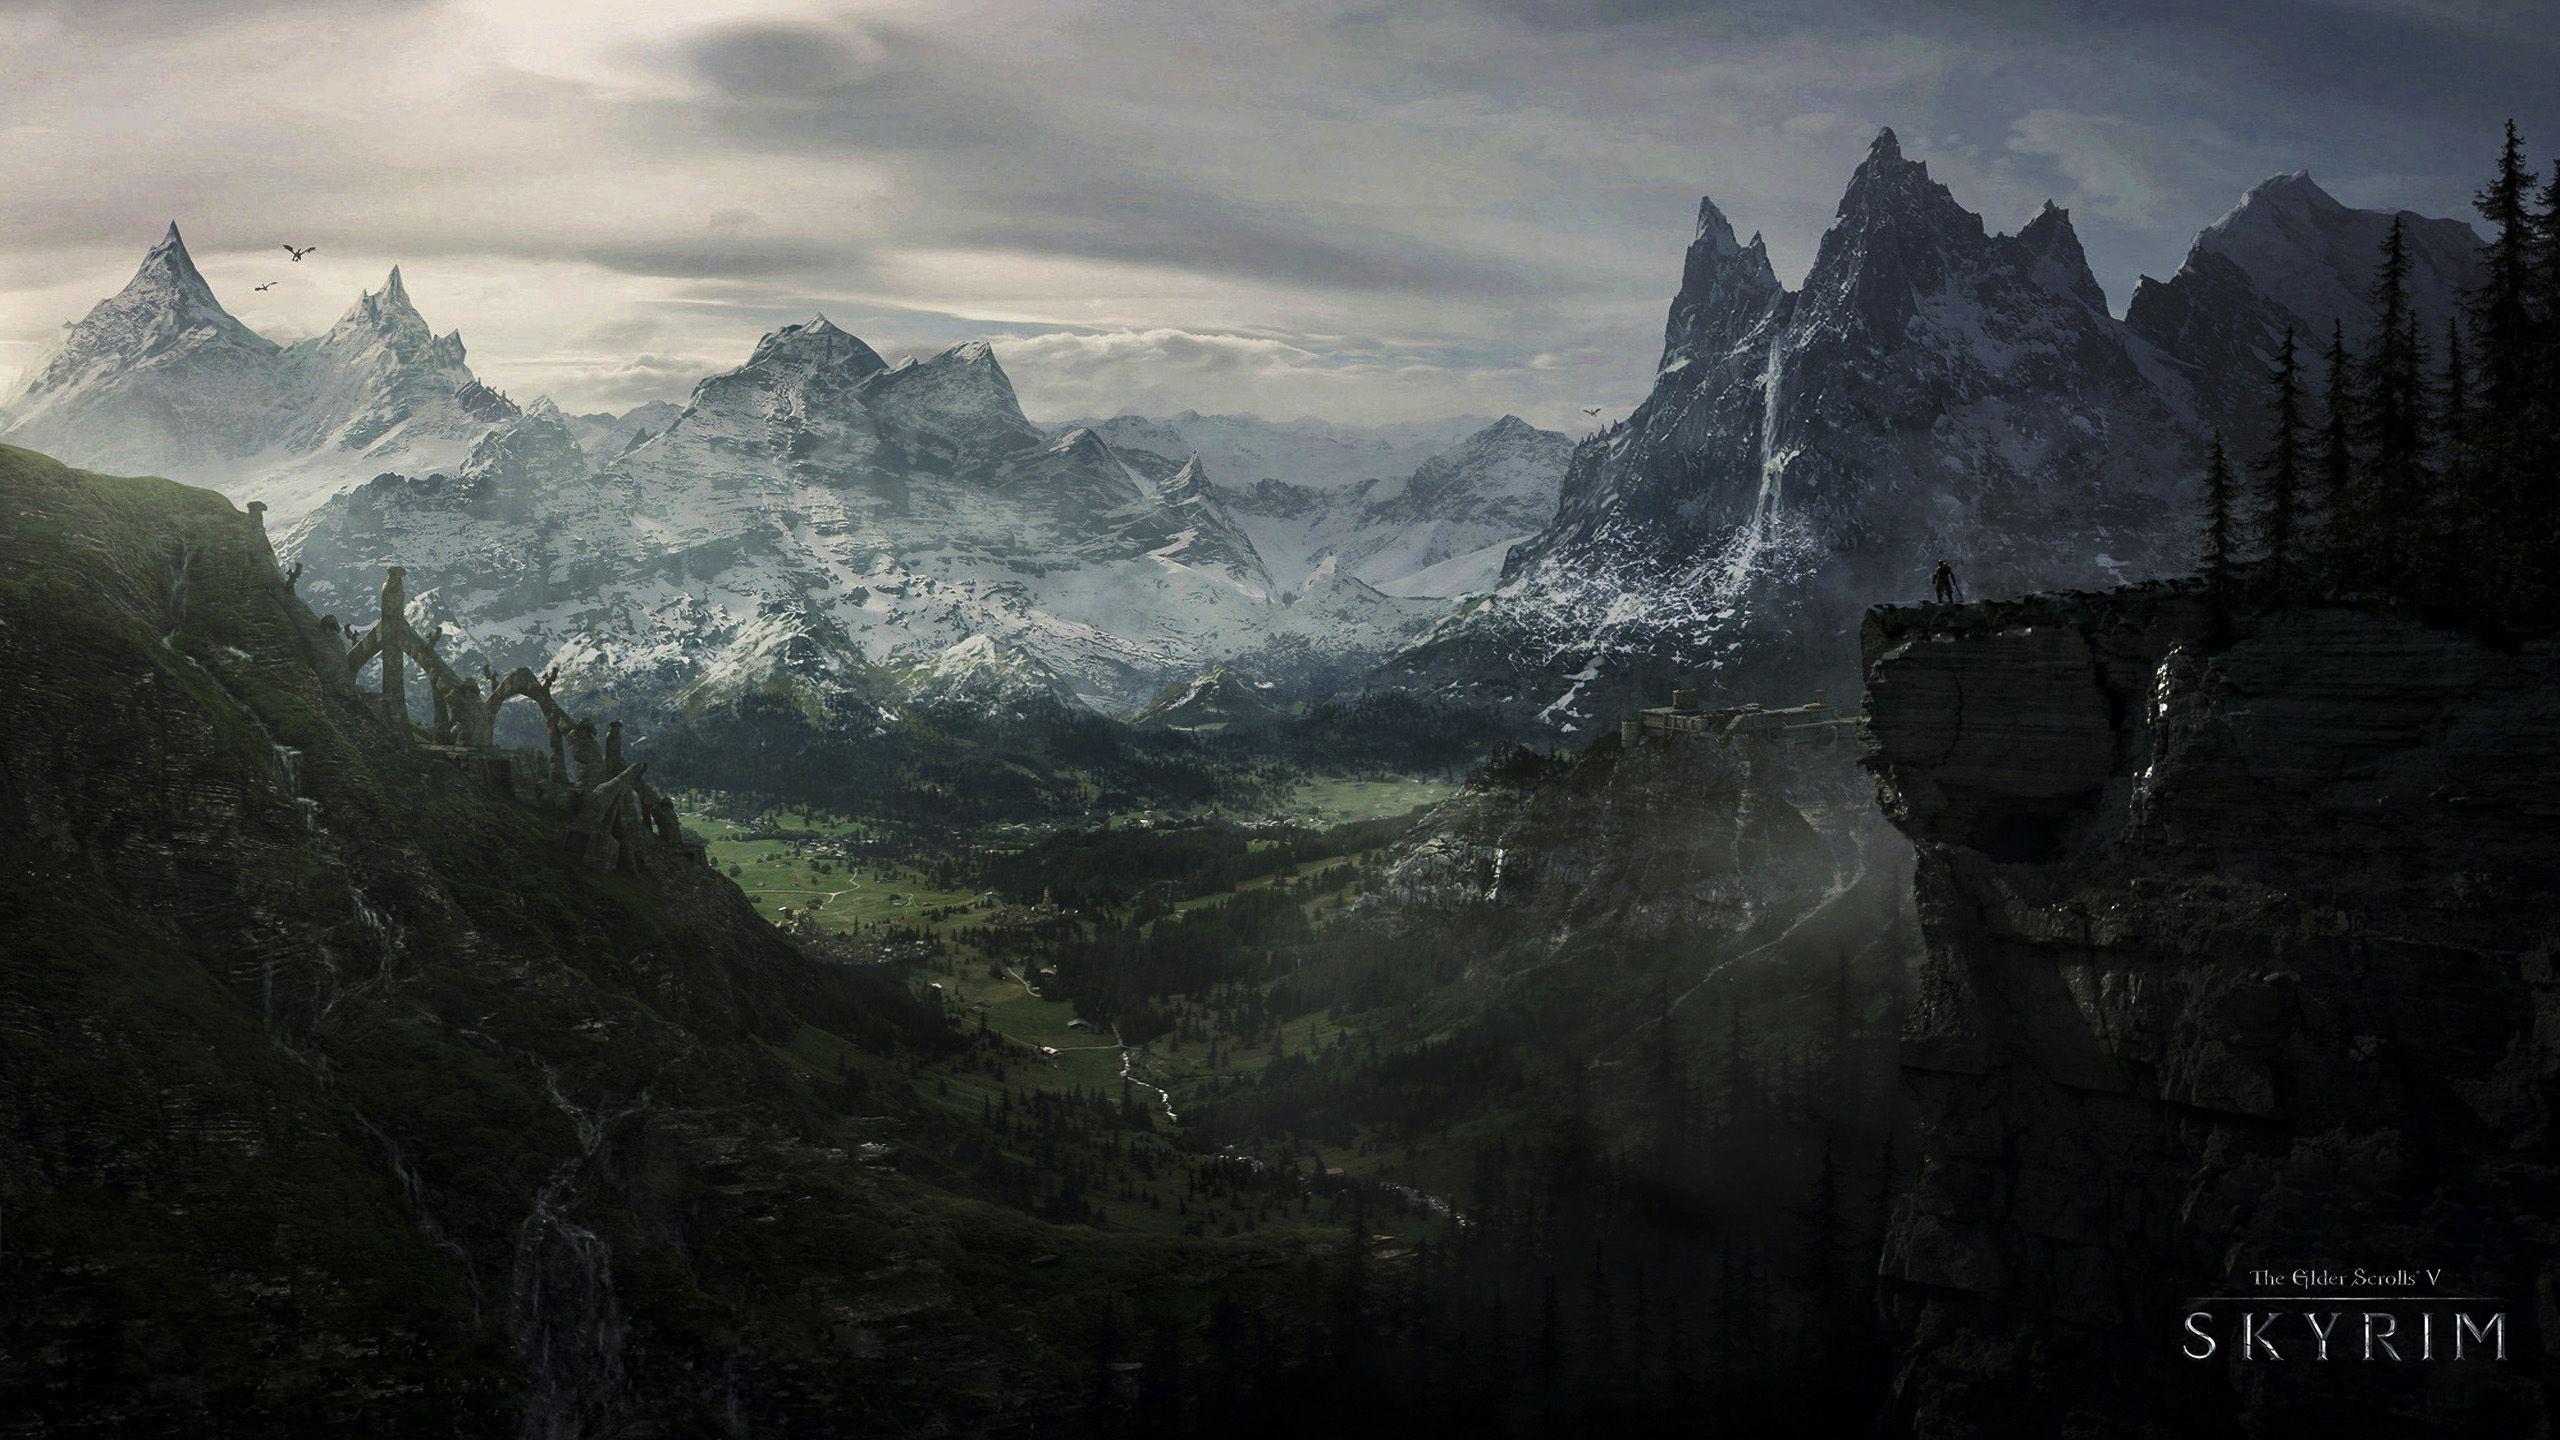 The Elder Scrolls V Skyrim Hd Wallpapers Backgrounds Skyrim Wallpaper Skyrim Art Skyrim